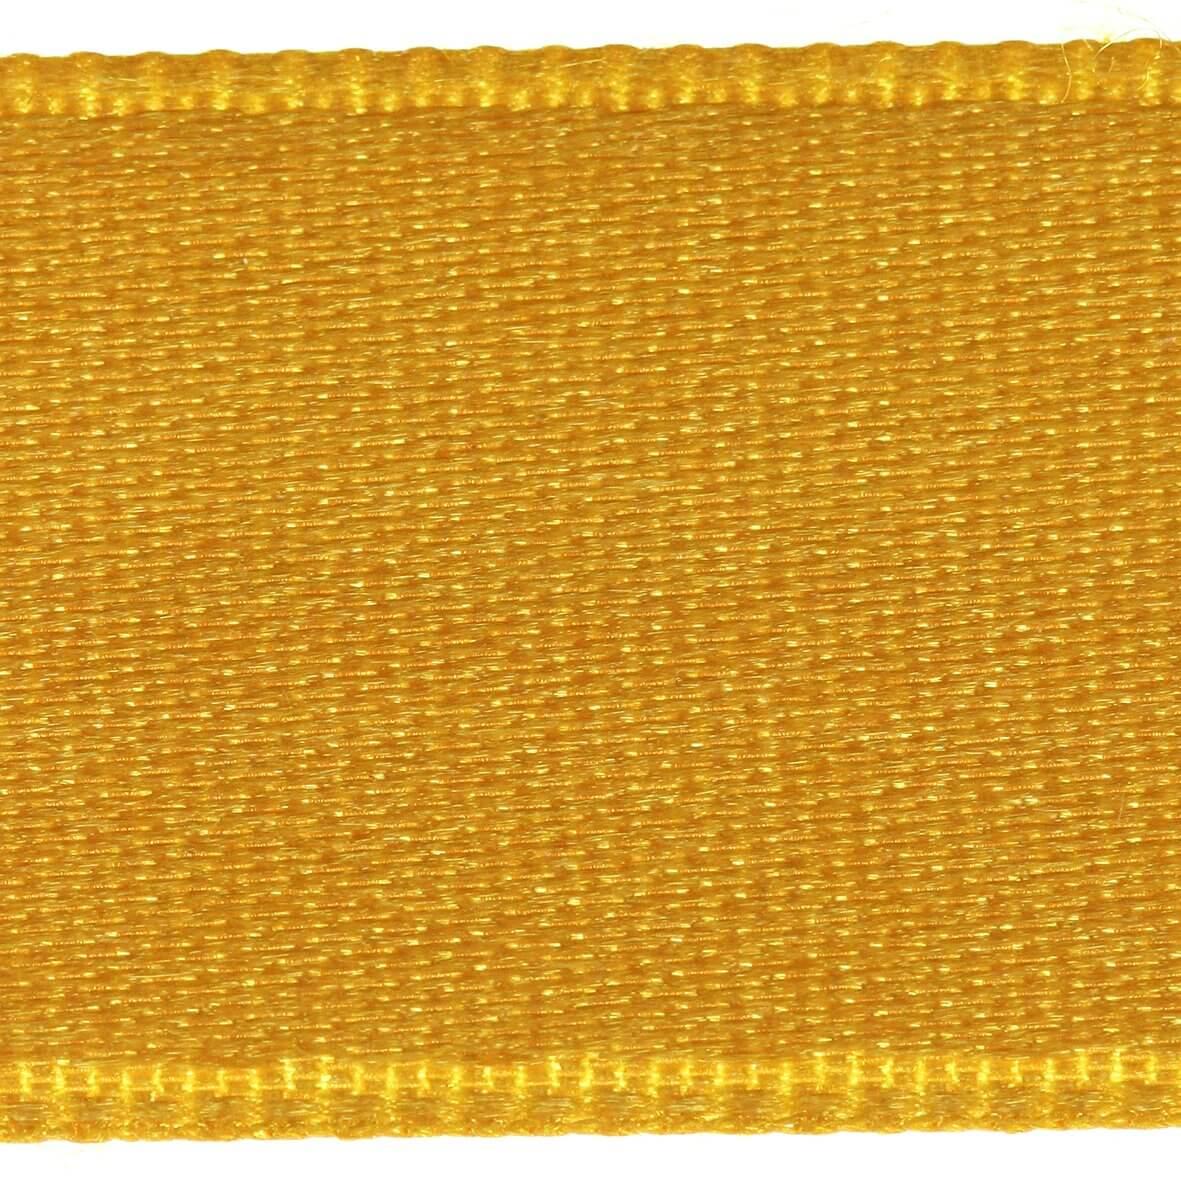 Lemon Zest Col. 287 - 25mm Satab Satin Ribbon